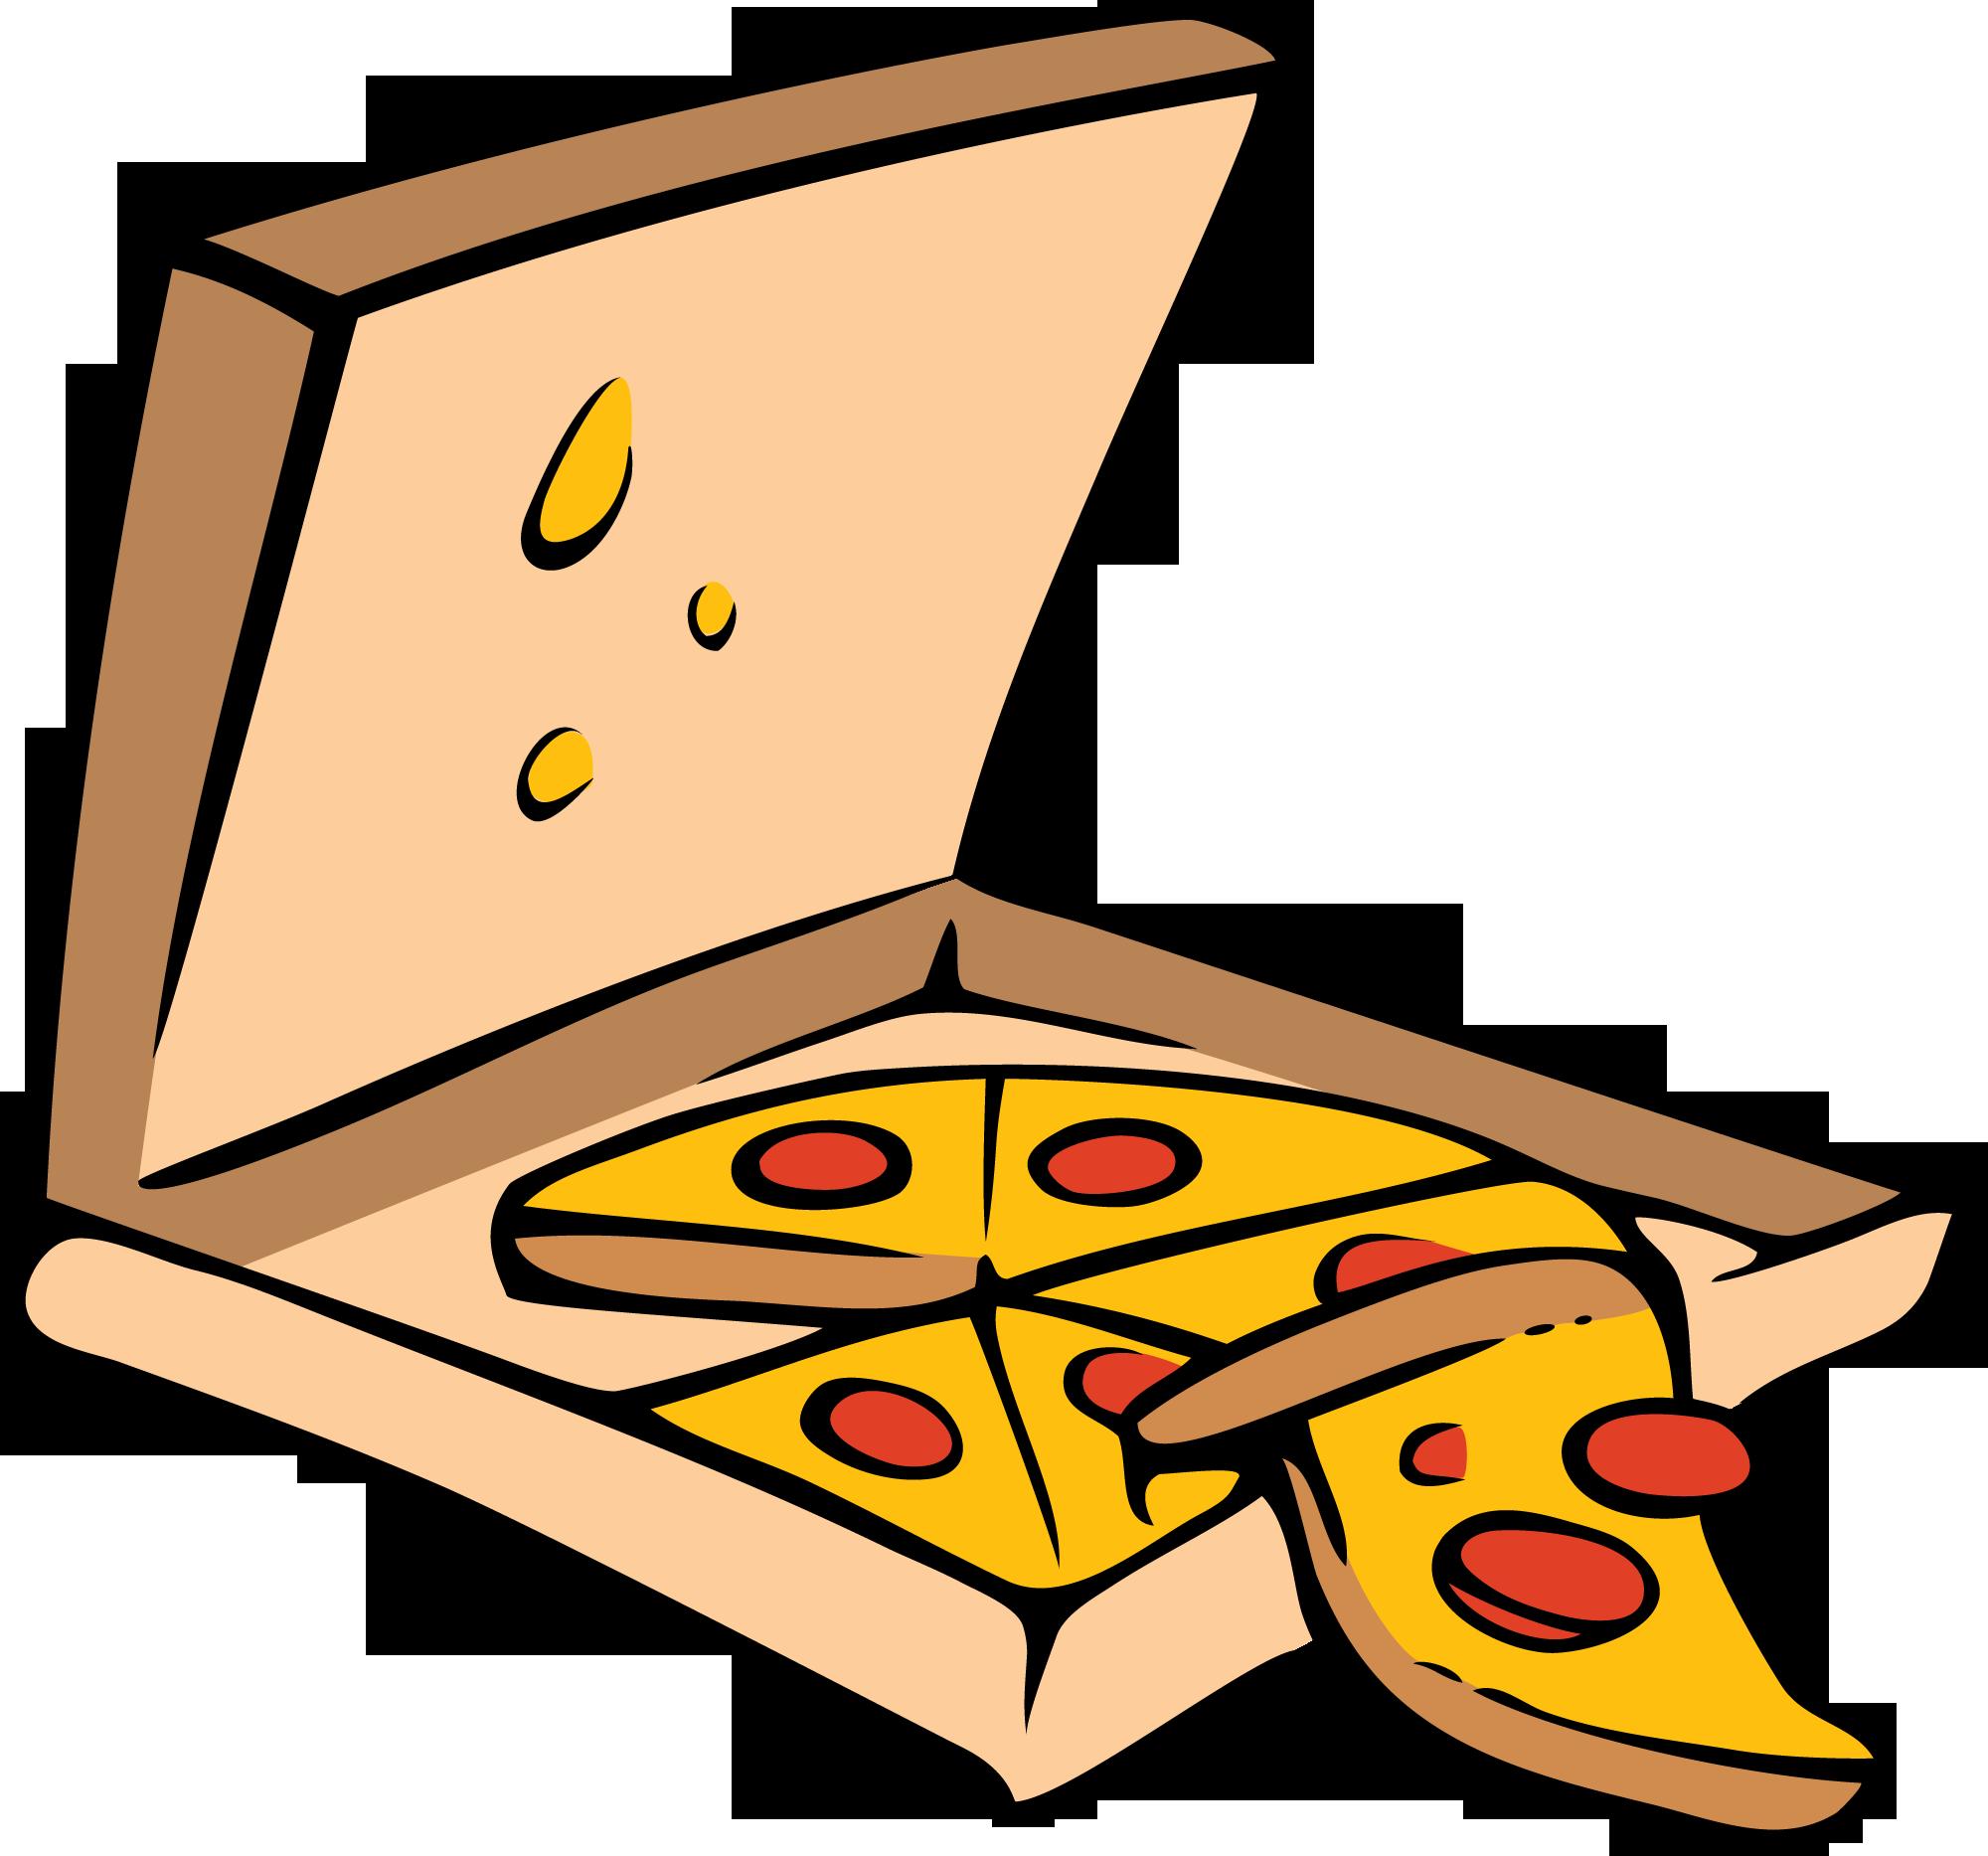 pizza box clipart free - photo #26